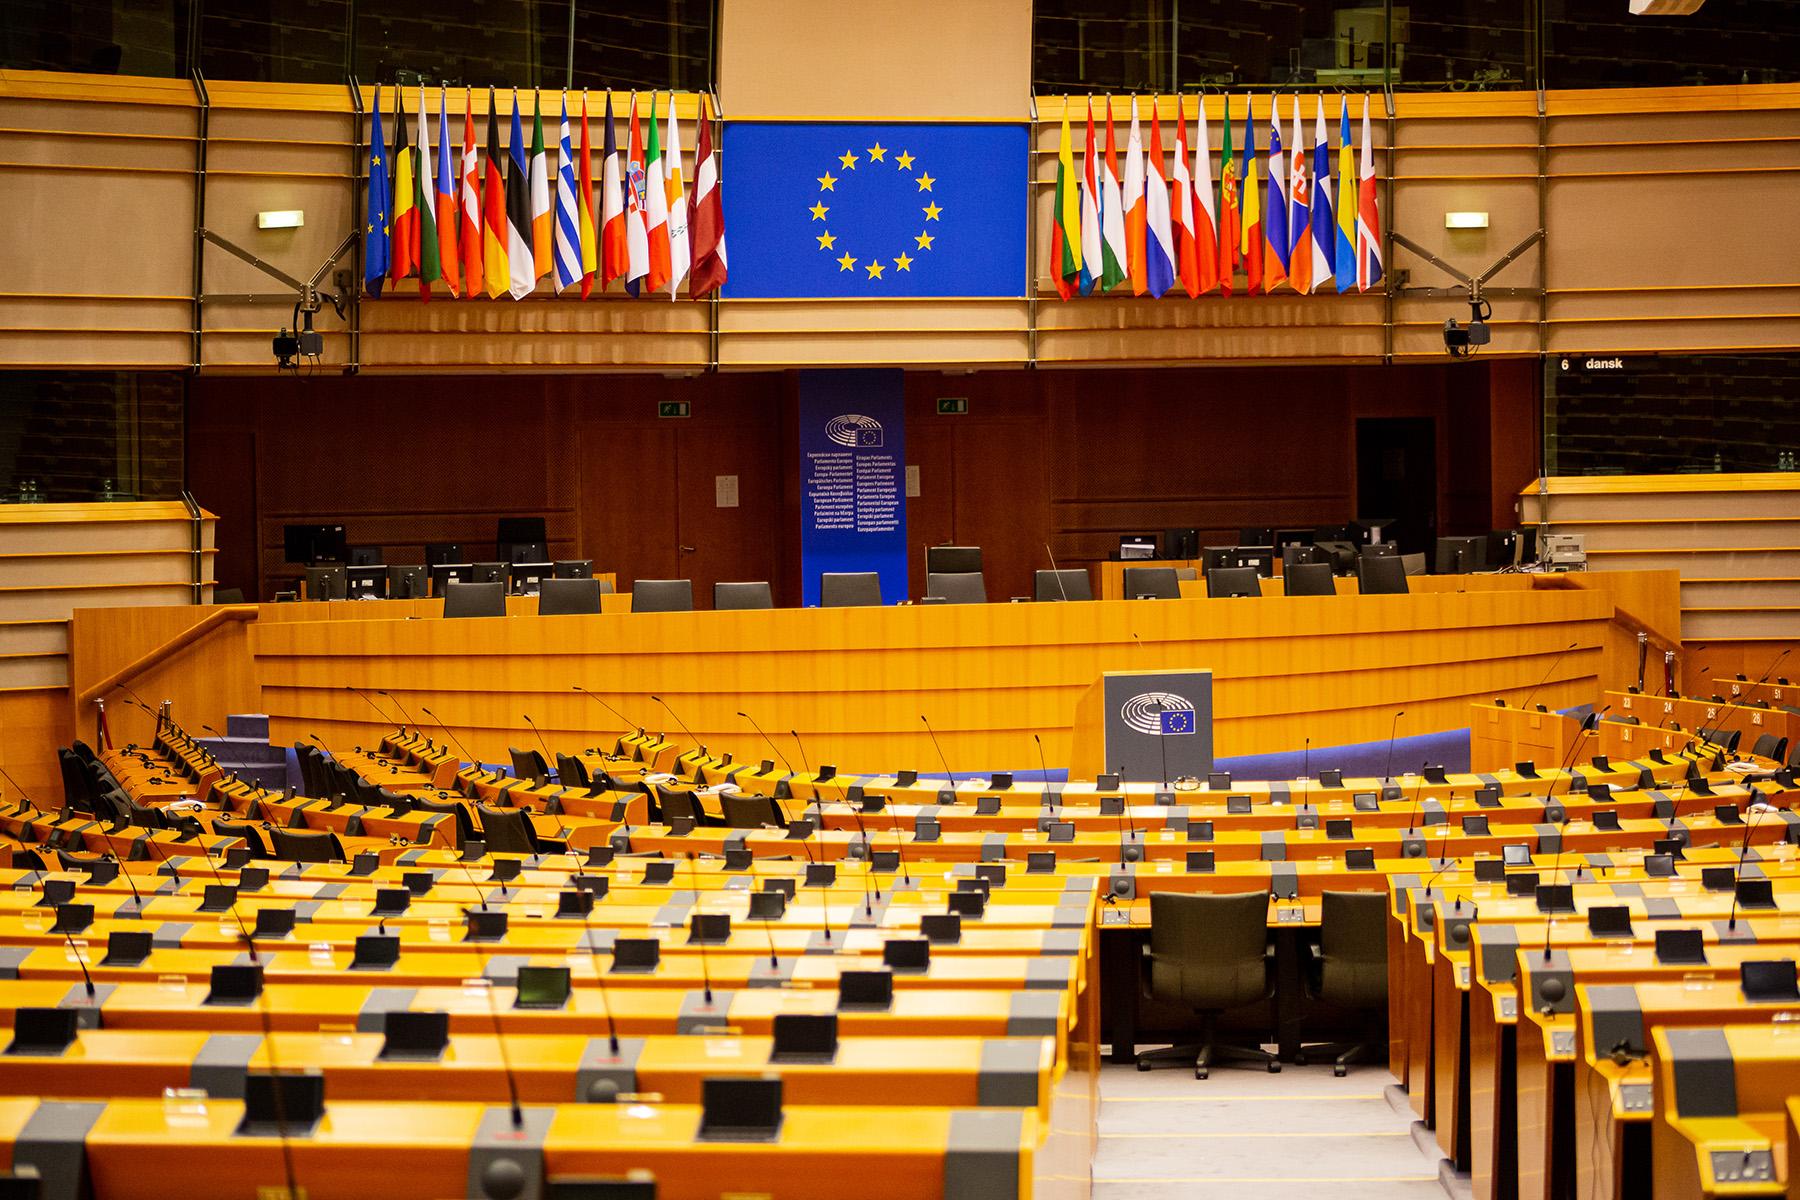 Plenary Hall of the European Parliament